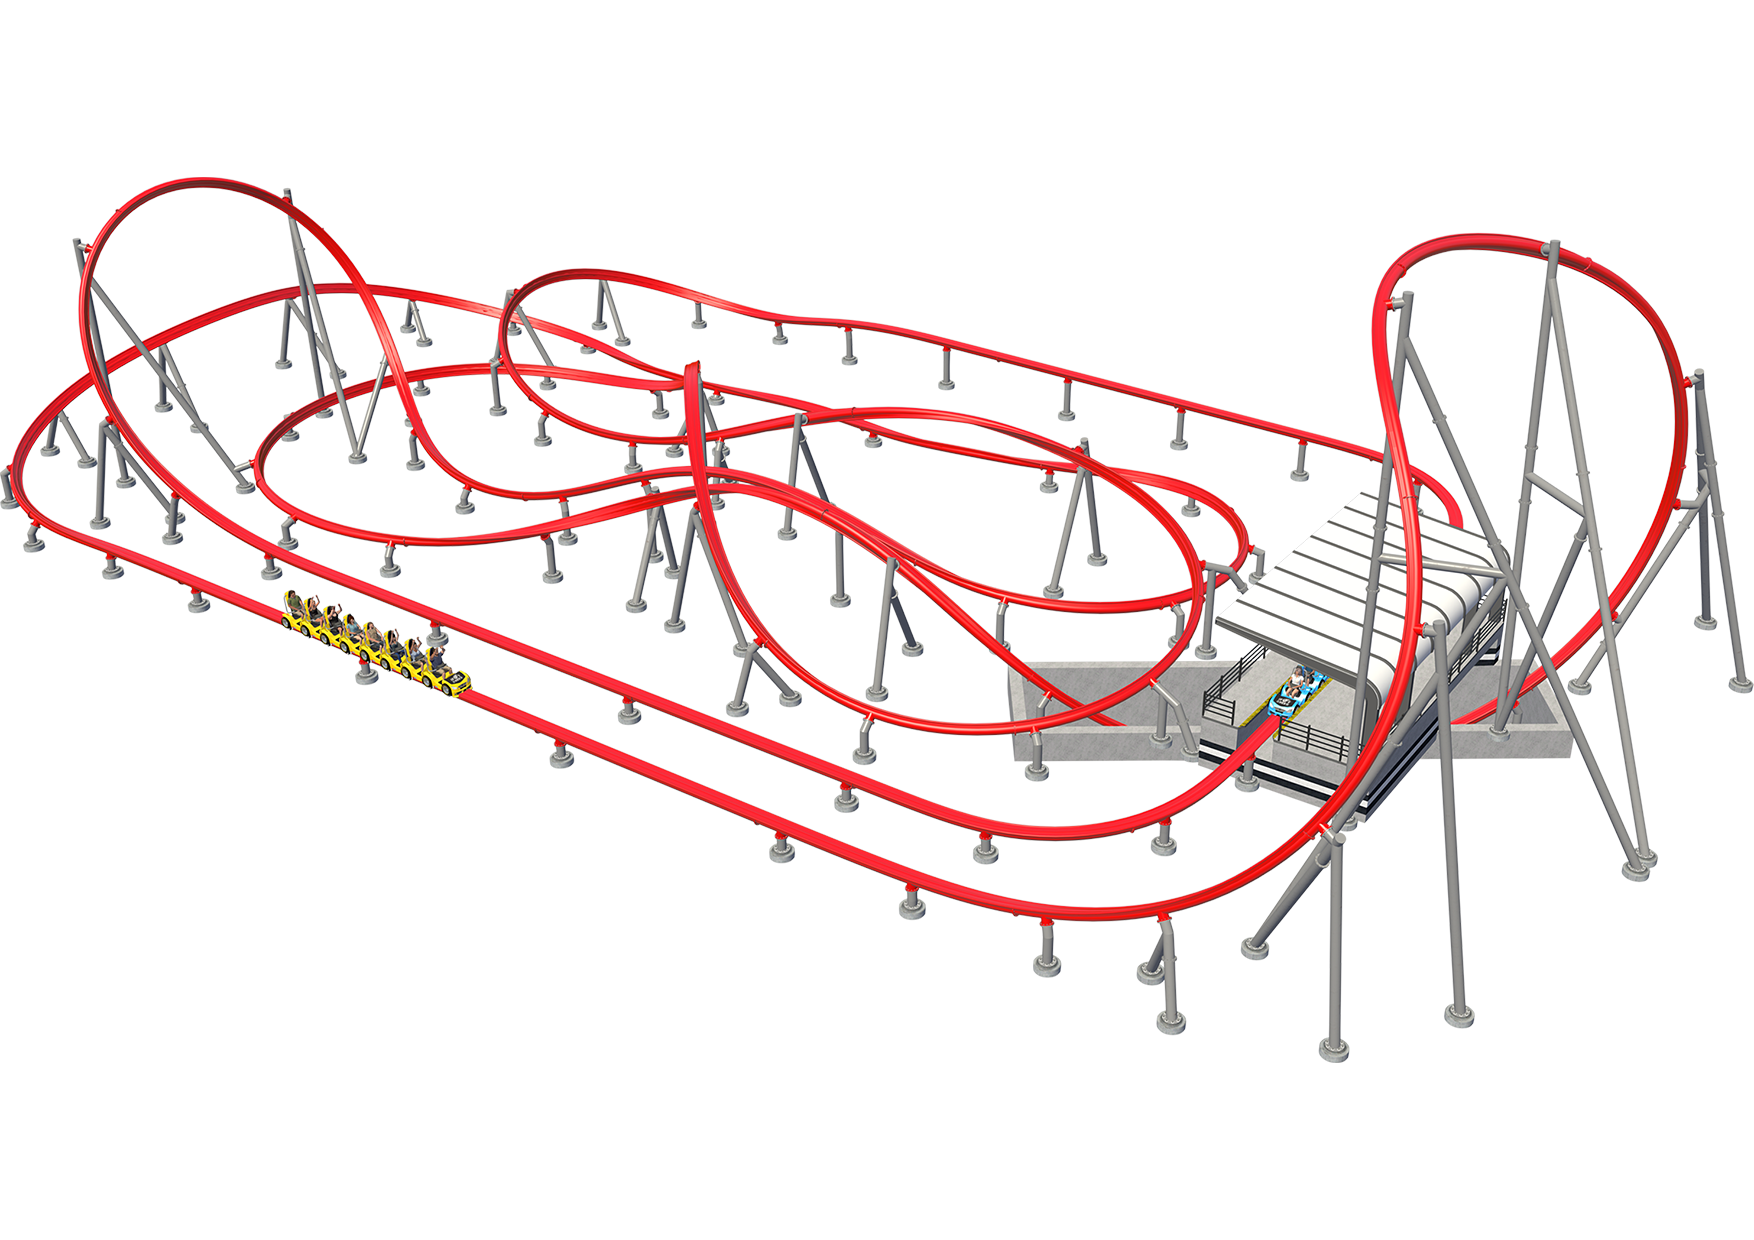 Intamin Sample Layout Hot Racer Overdrive Roller Coaster